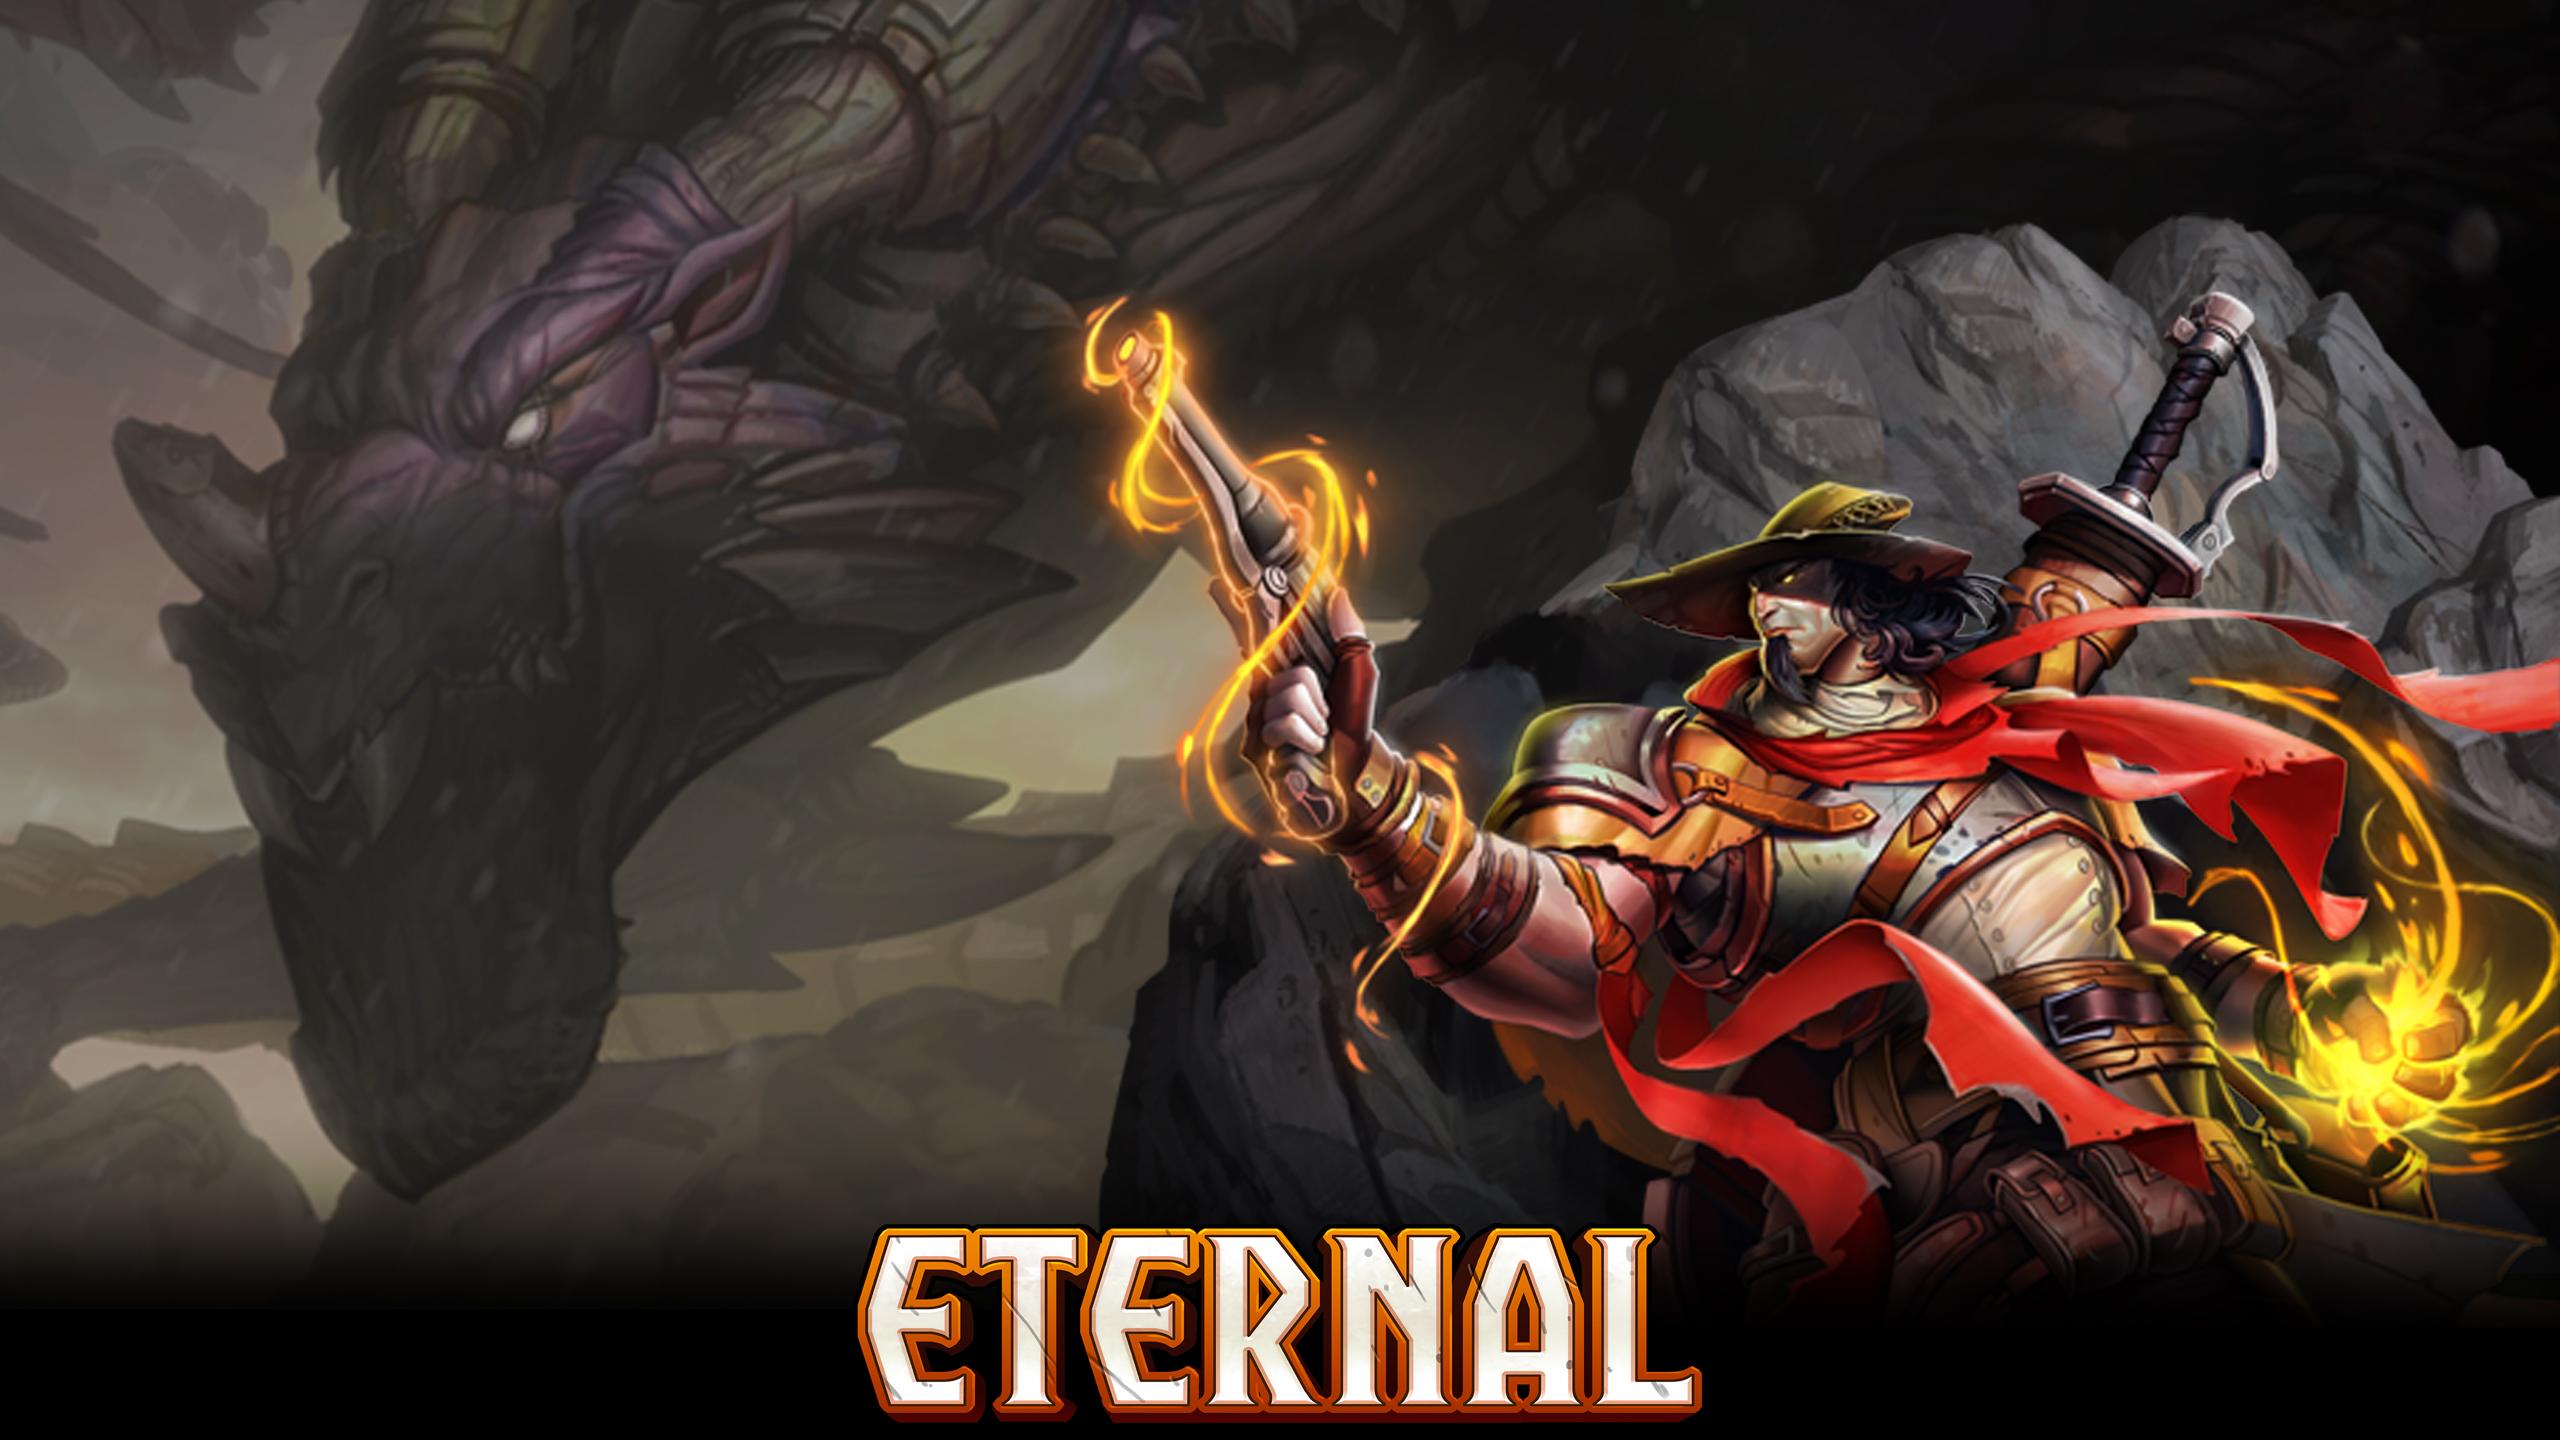 Eternal - Dire Wolf Digital